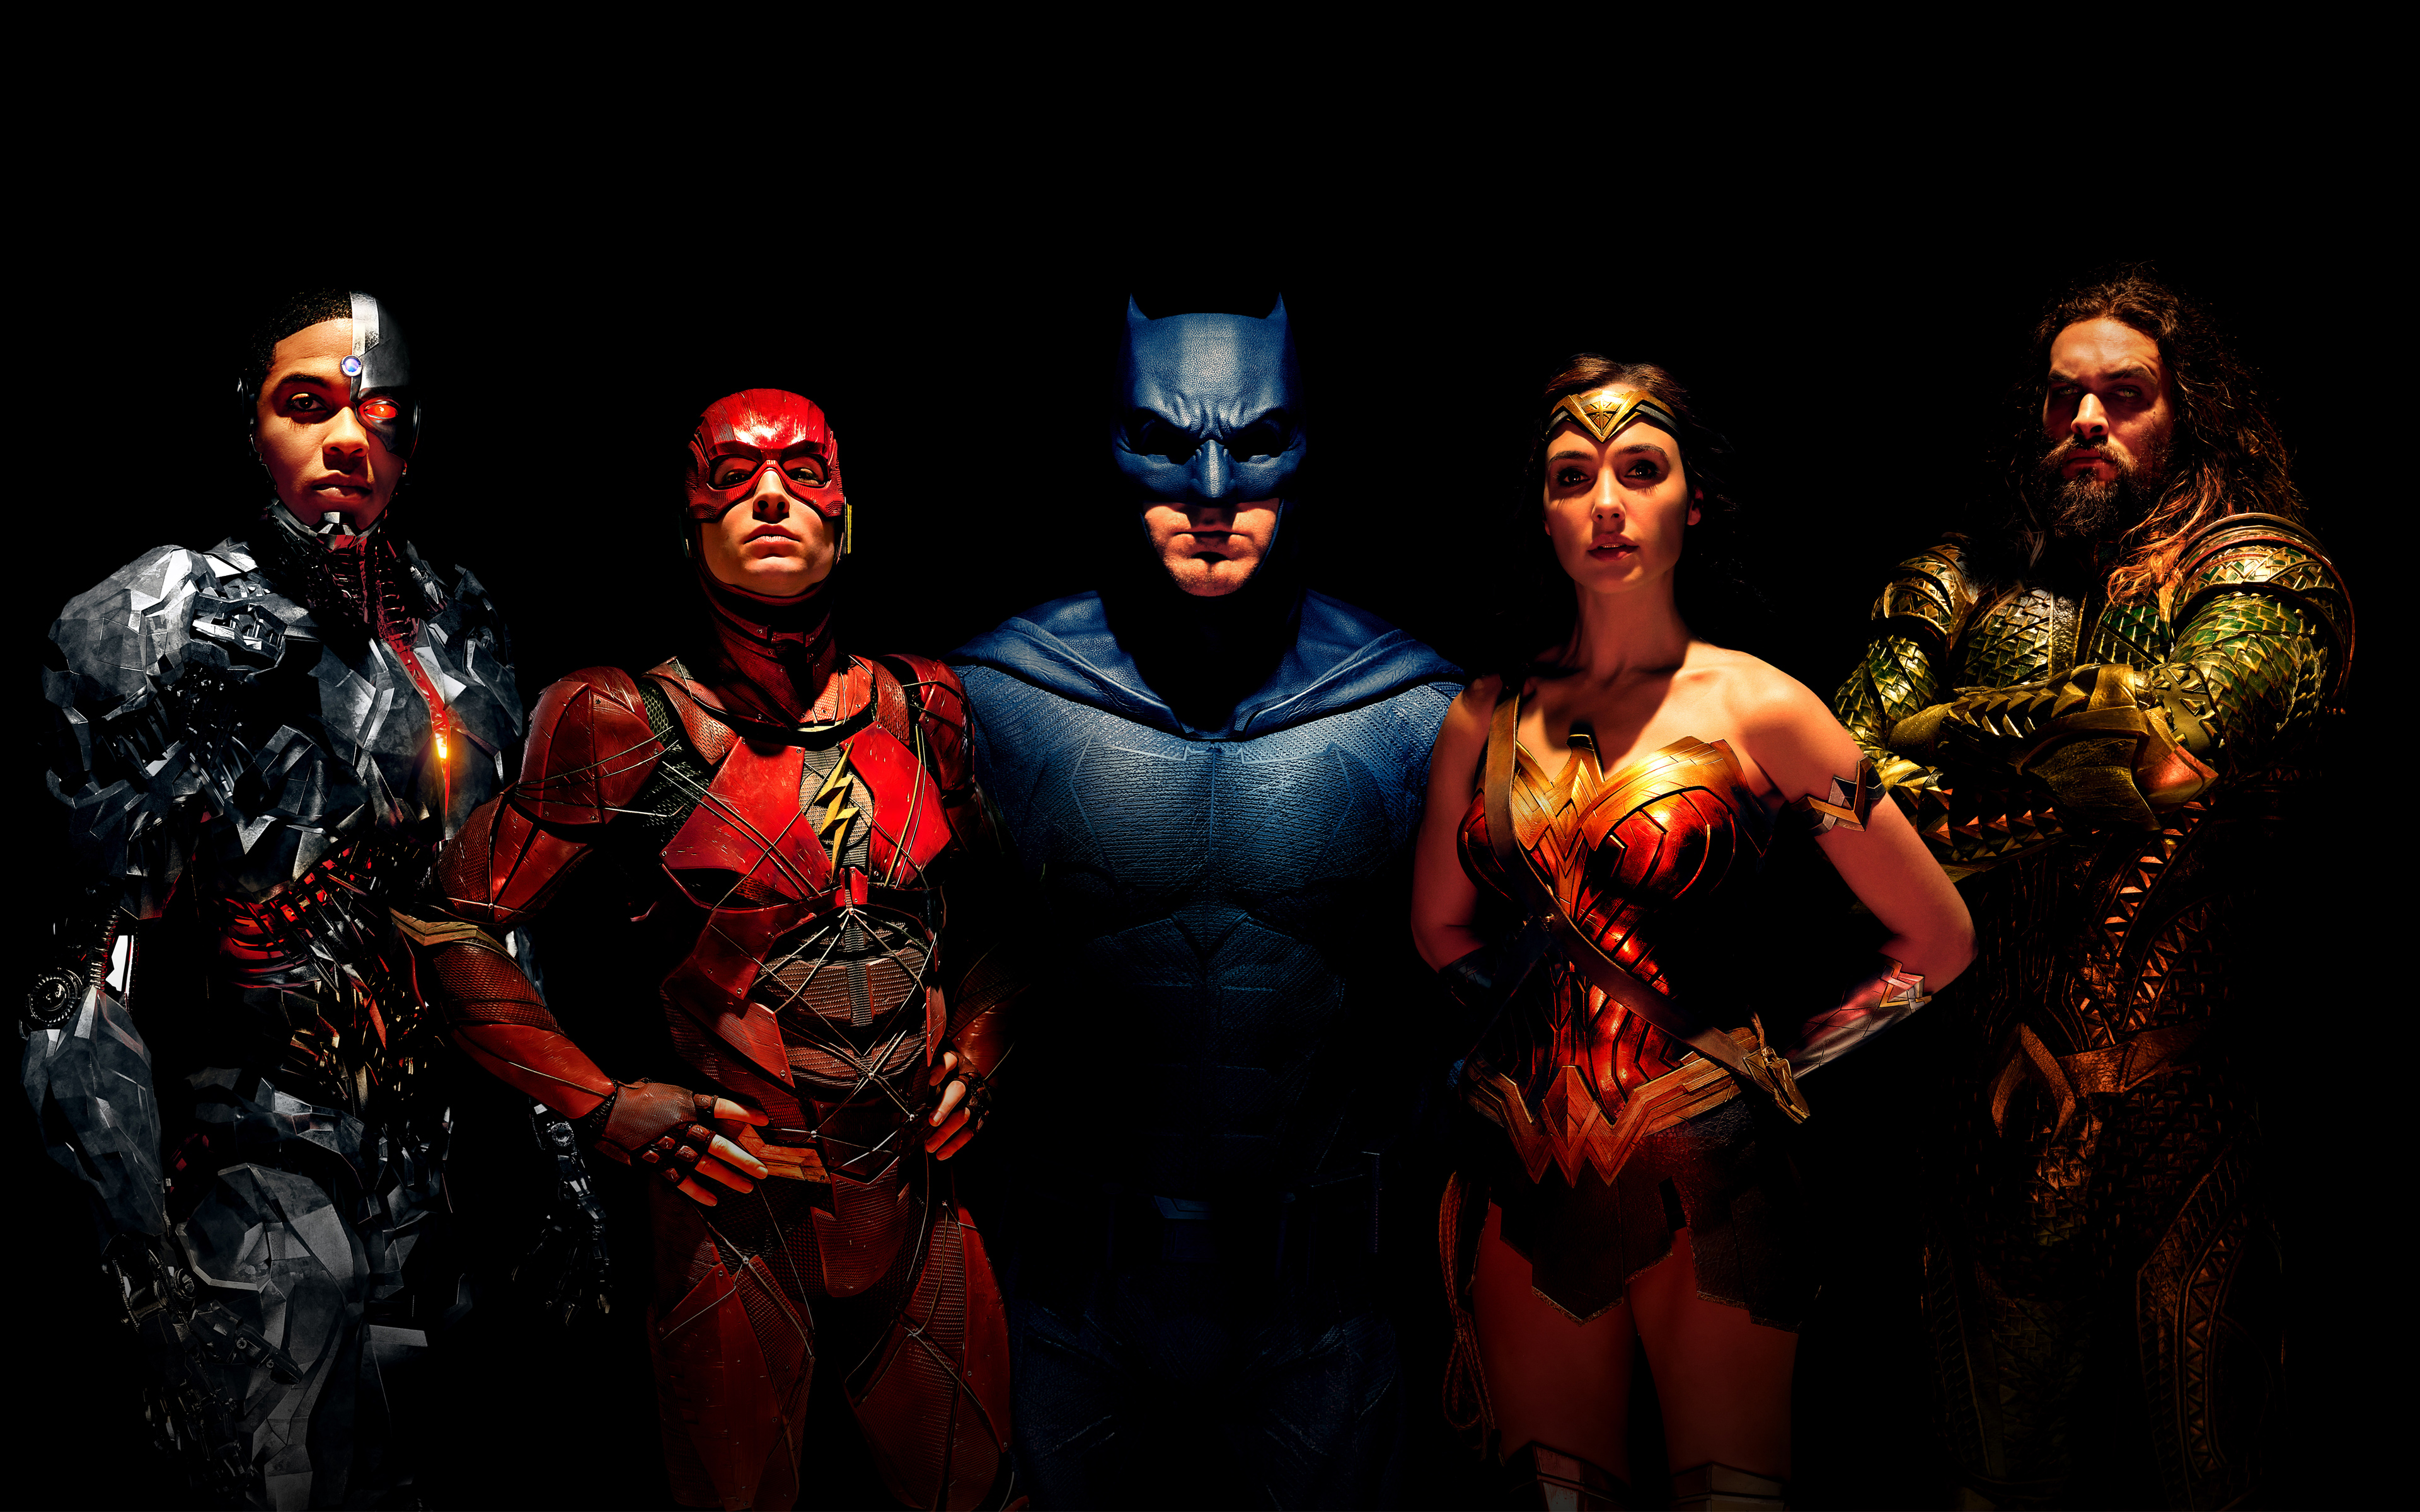 Justice League 2017 Movie 4k Hd Desktop Wallpaper For 4k: Justice League 2017 4k Unite The League, HD Movies, 4k